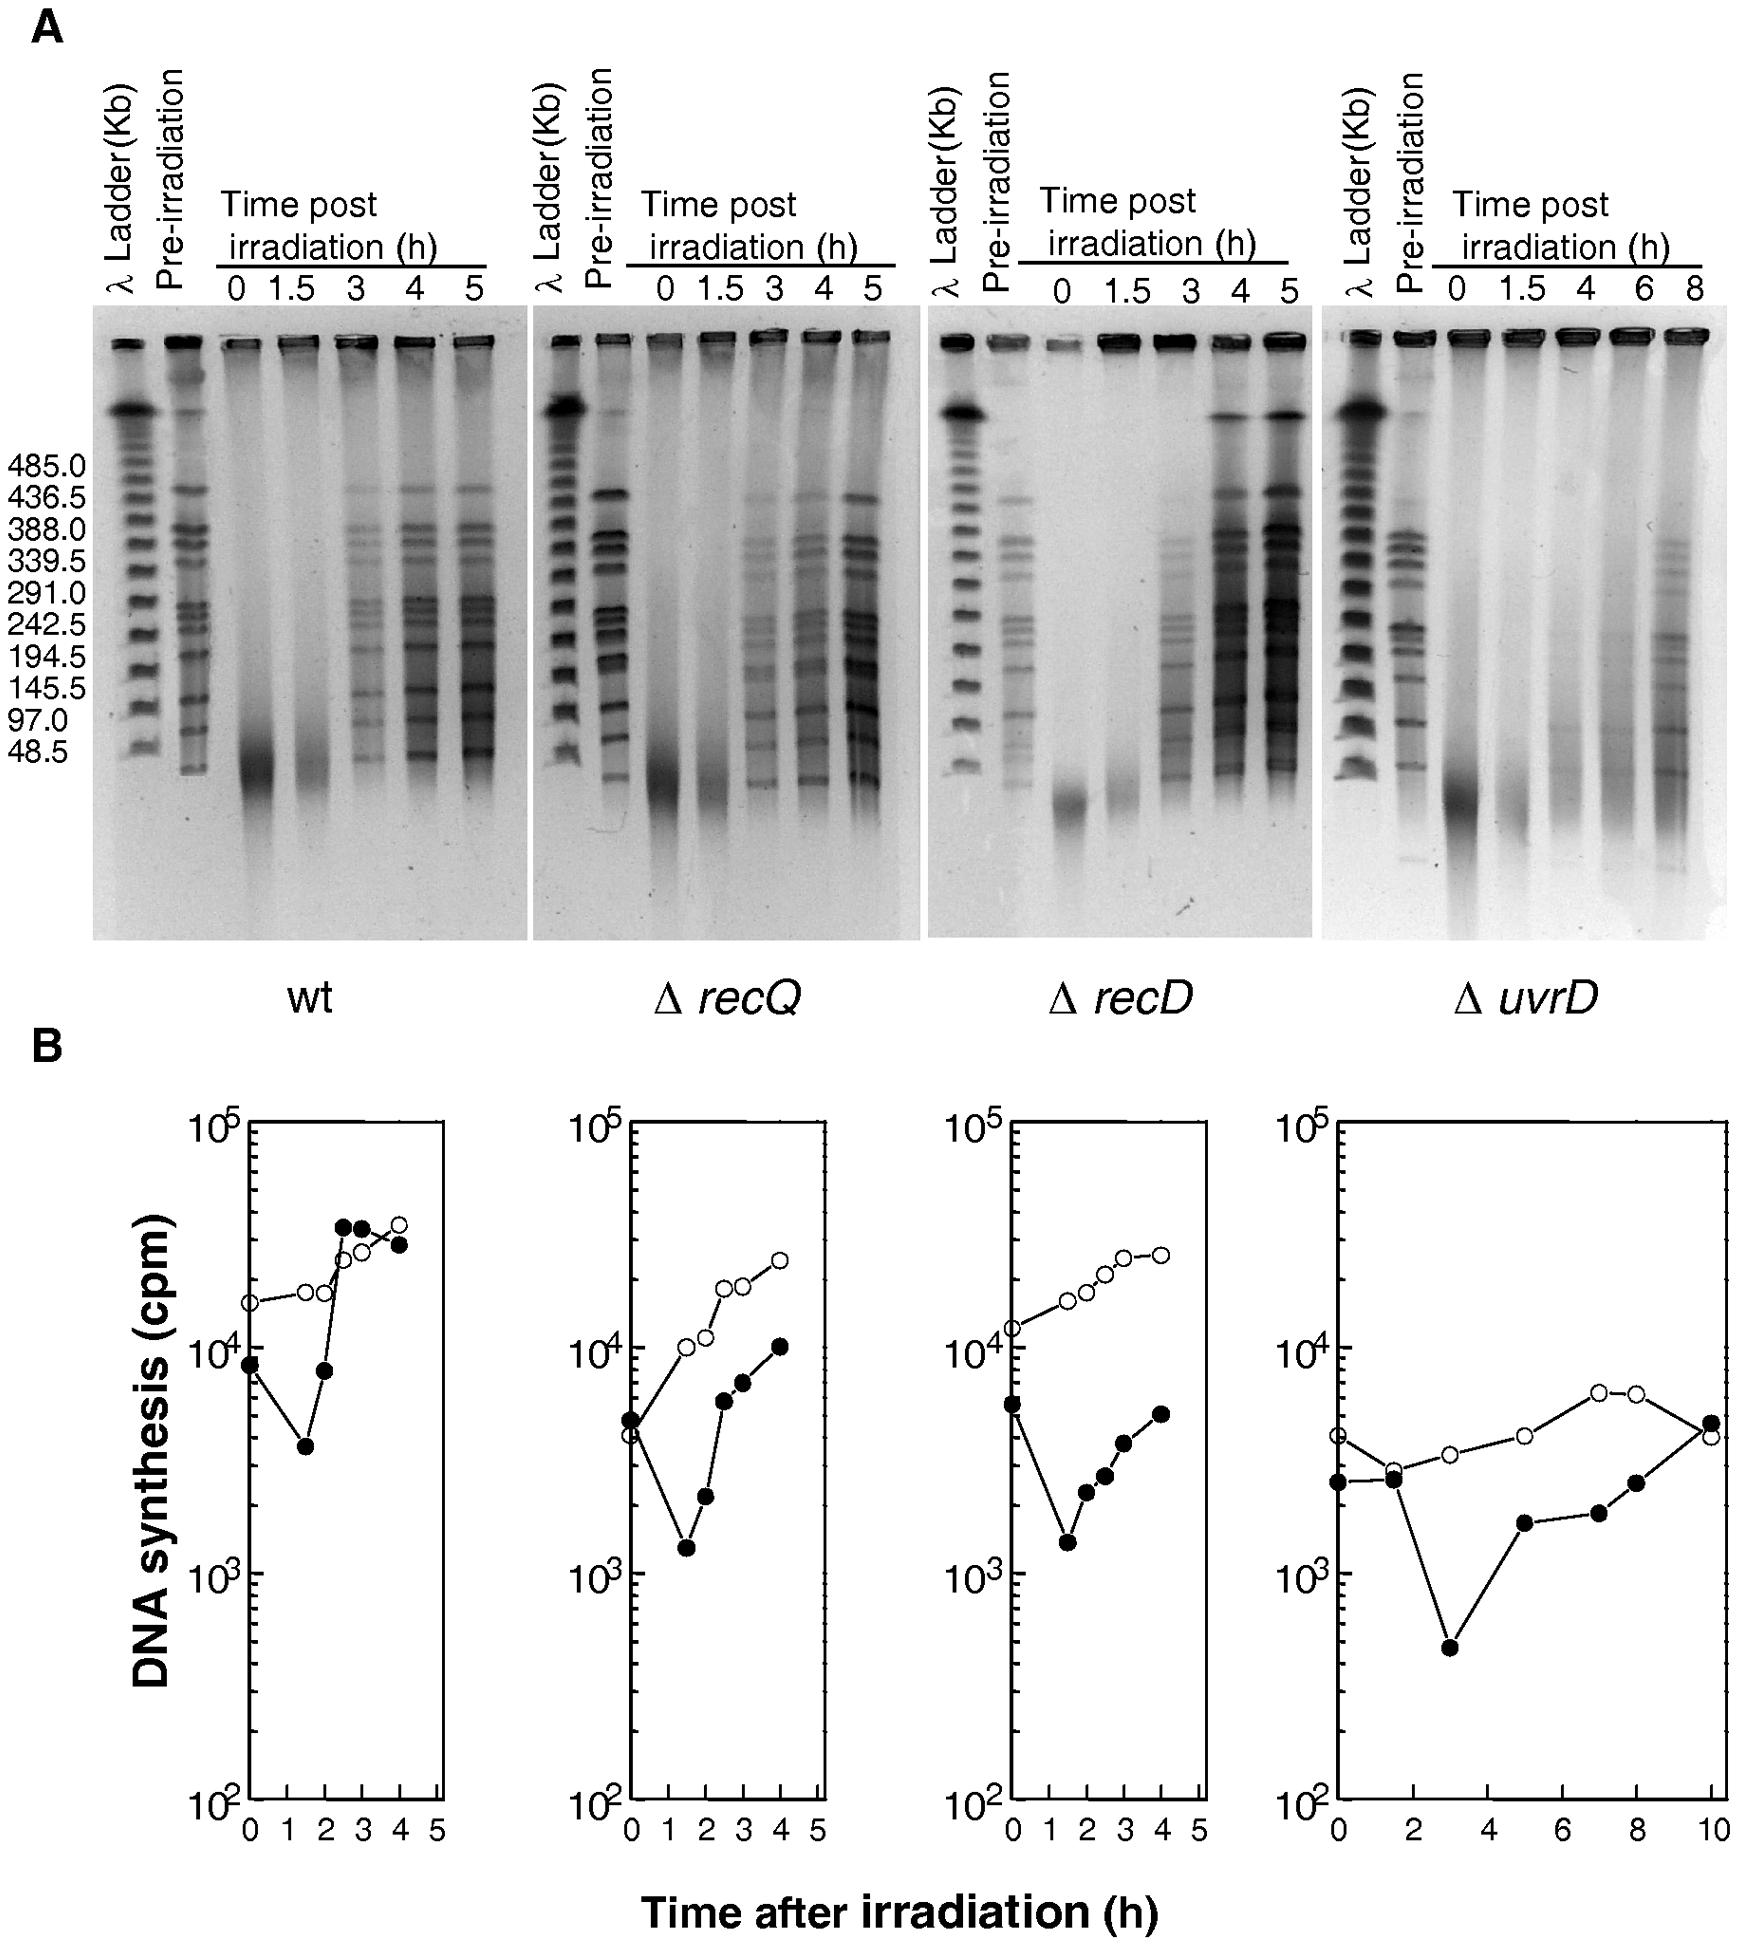 DNA repair and DNA synthesis in Δ<i>recQ</i>, Δ<i>recD</i>, and Δ<i>uvrD</i> mutants.